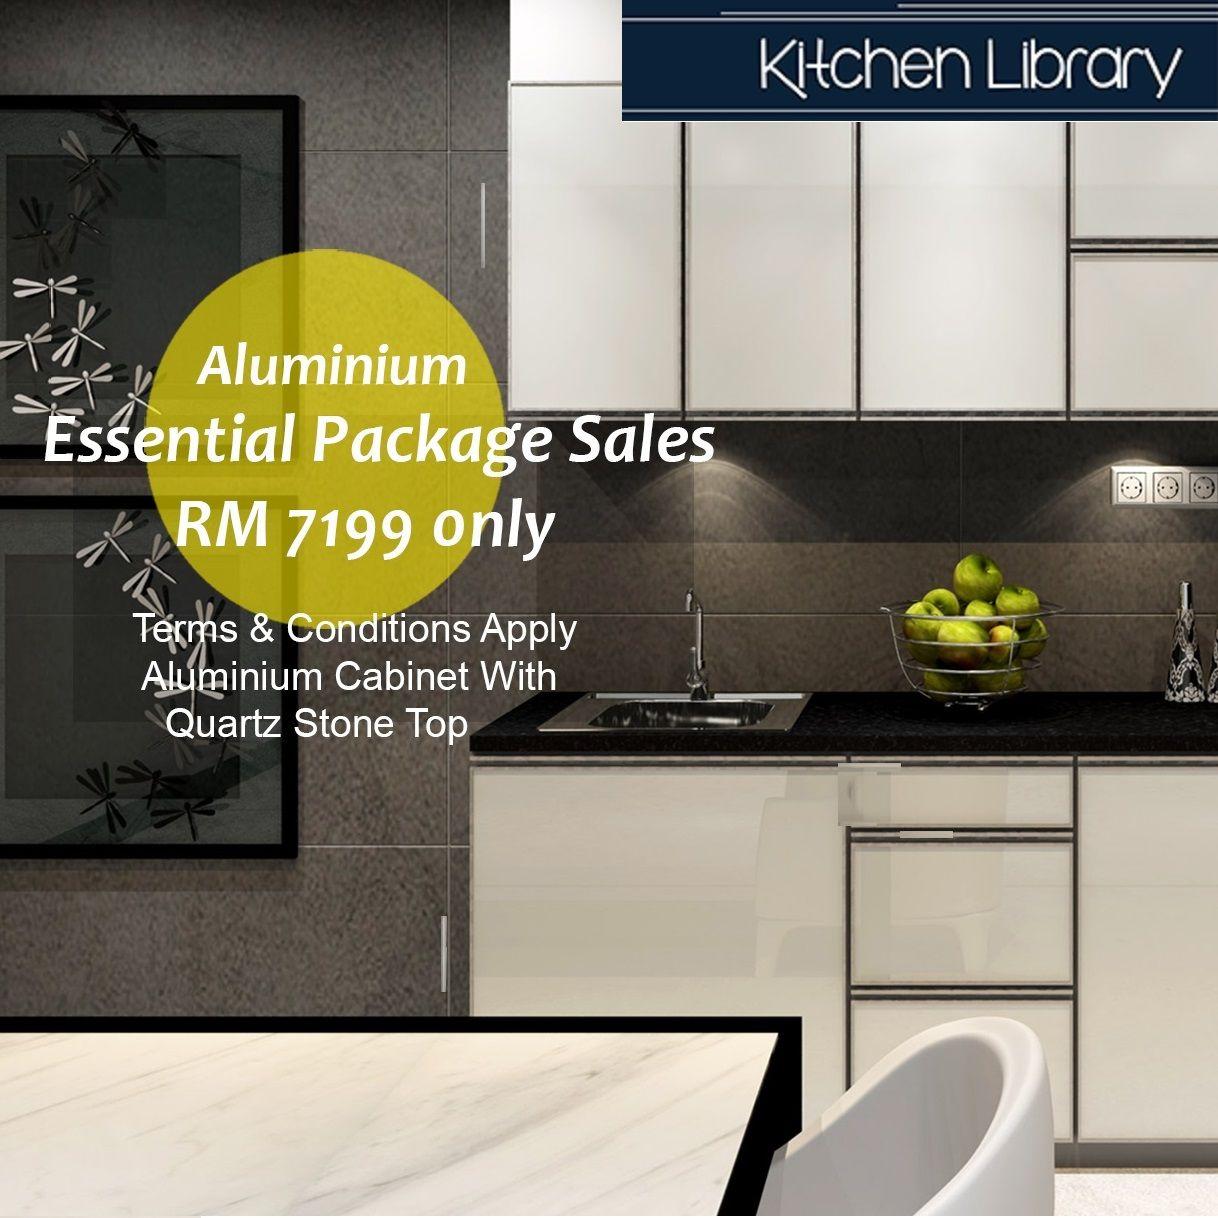 Www.kitchen Cabinets Kitchen Columns 优惠期有限哦 Library橱柜新年优惠配套 Buzzytime Com